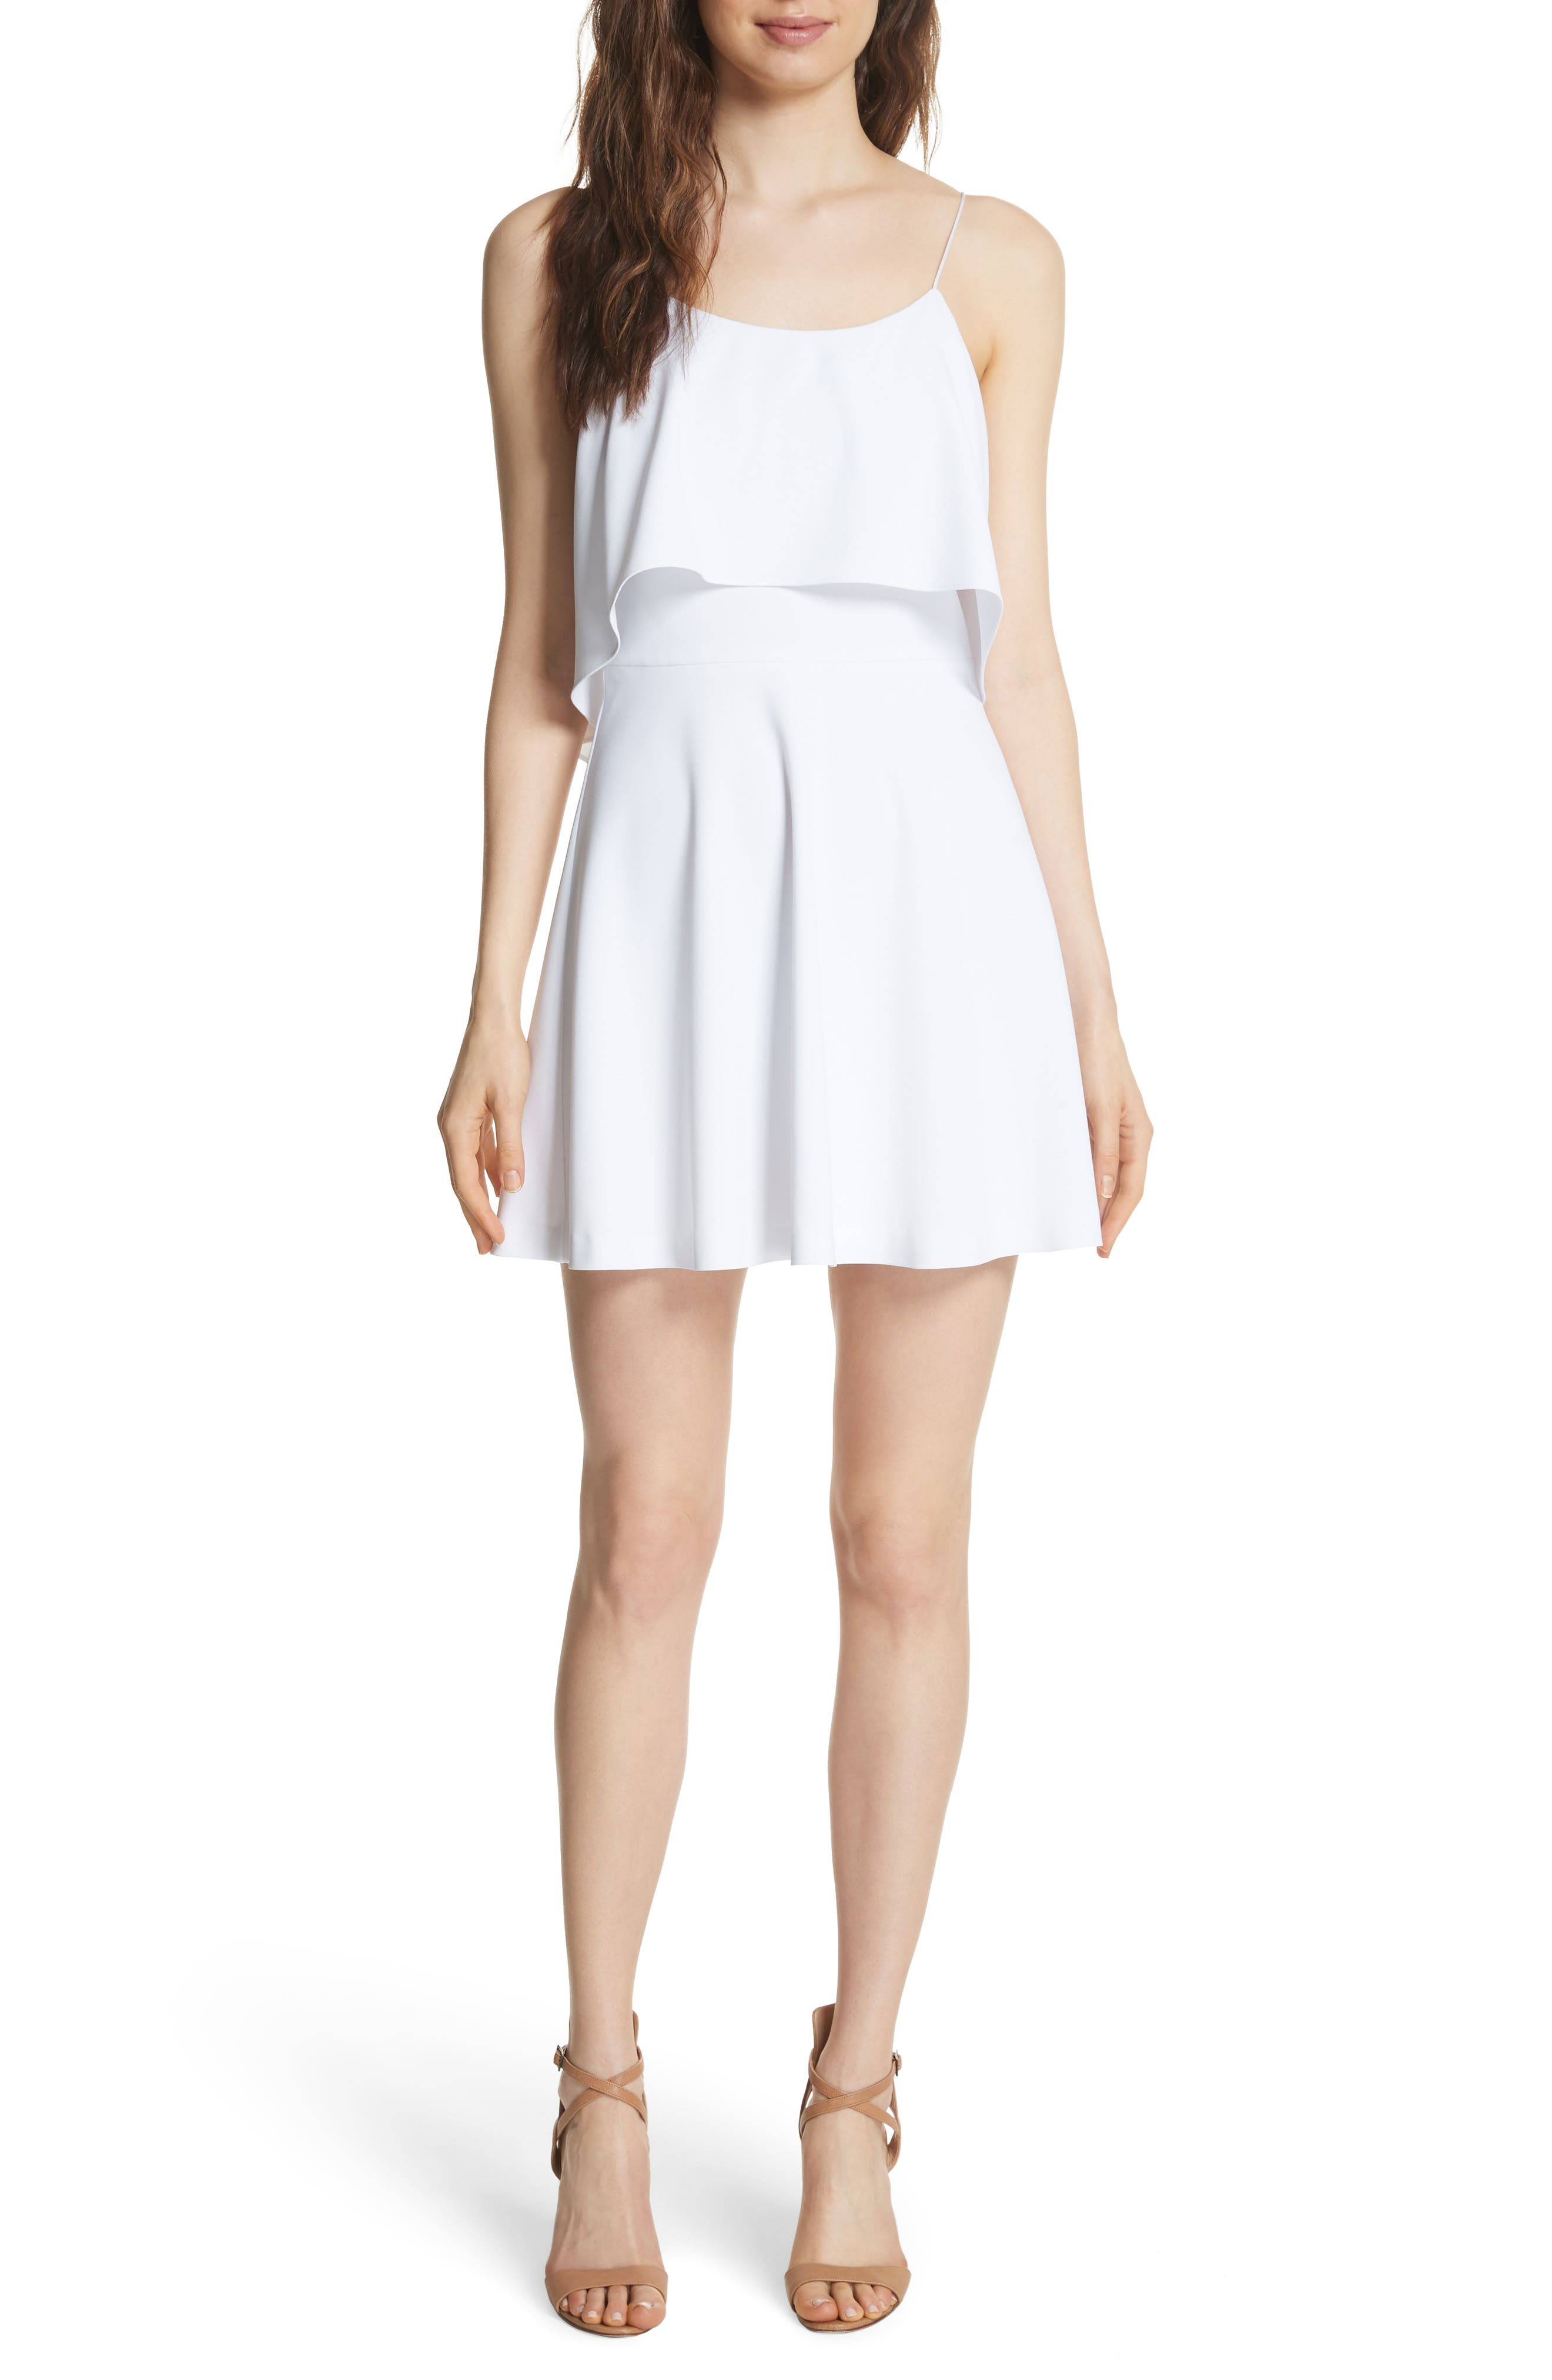 Main Image - Alice + Olivia Kipp Layered Ruffle Short Dress